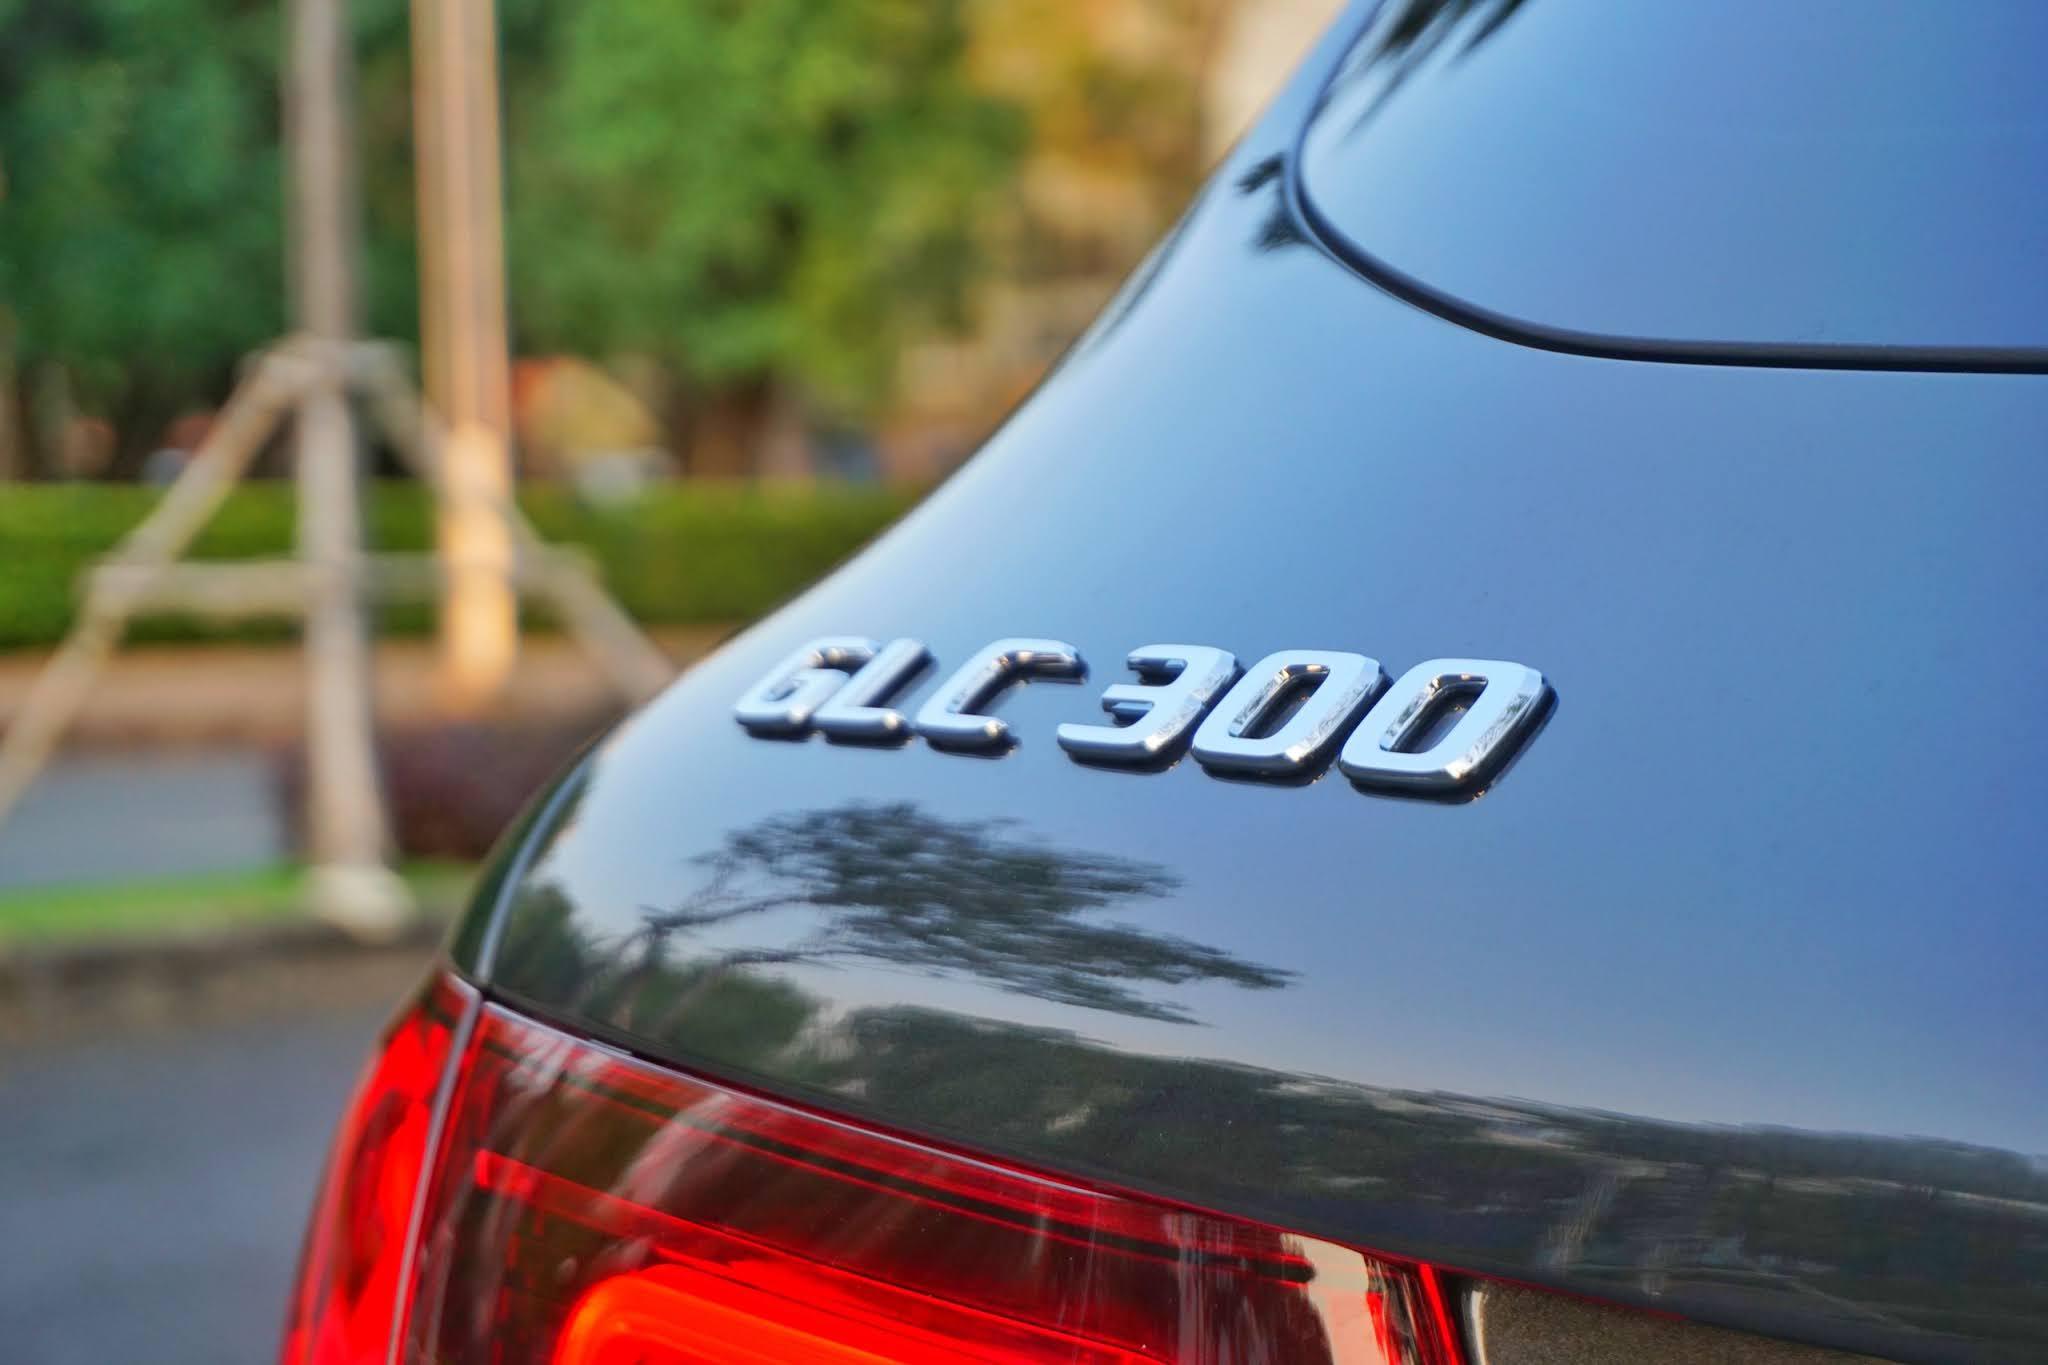 Mercedes GLC300 4Matic sx 2020 dkld 122020 moi lan banh 1300miles